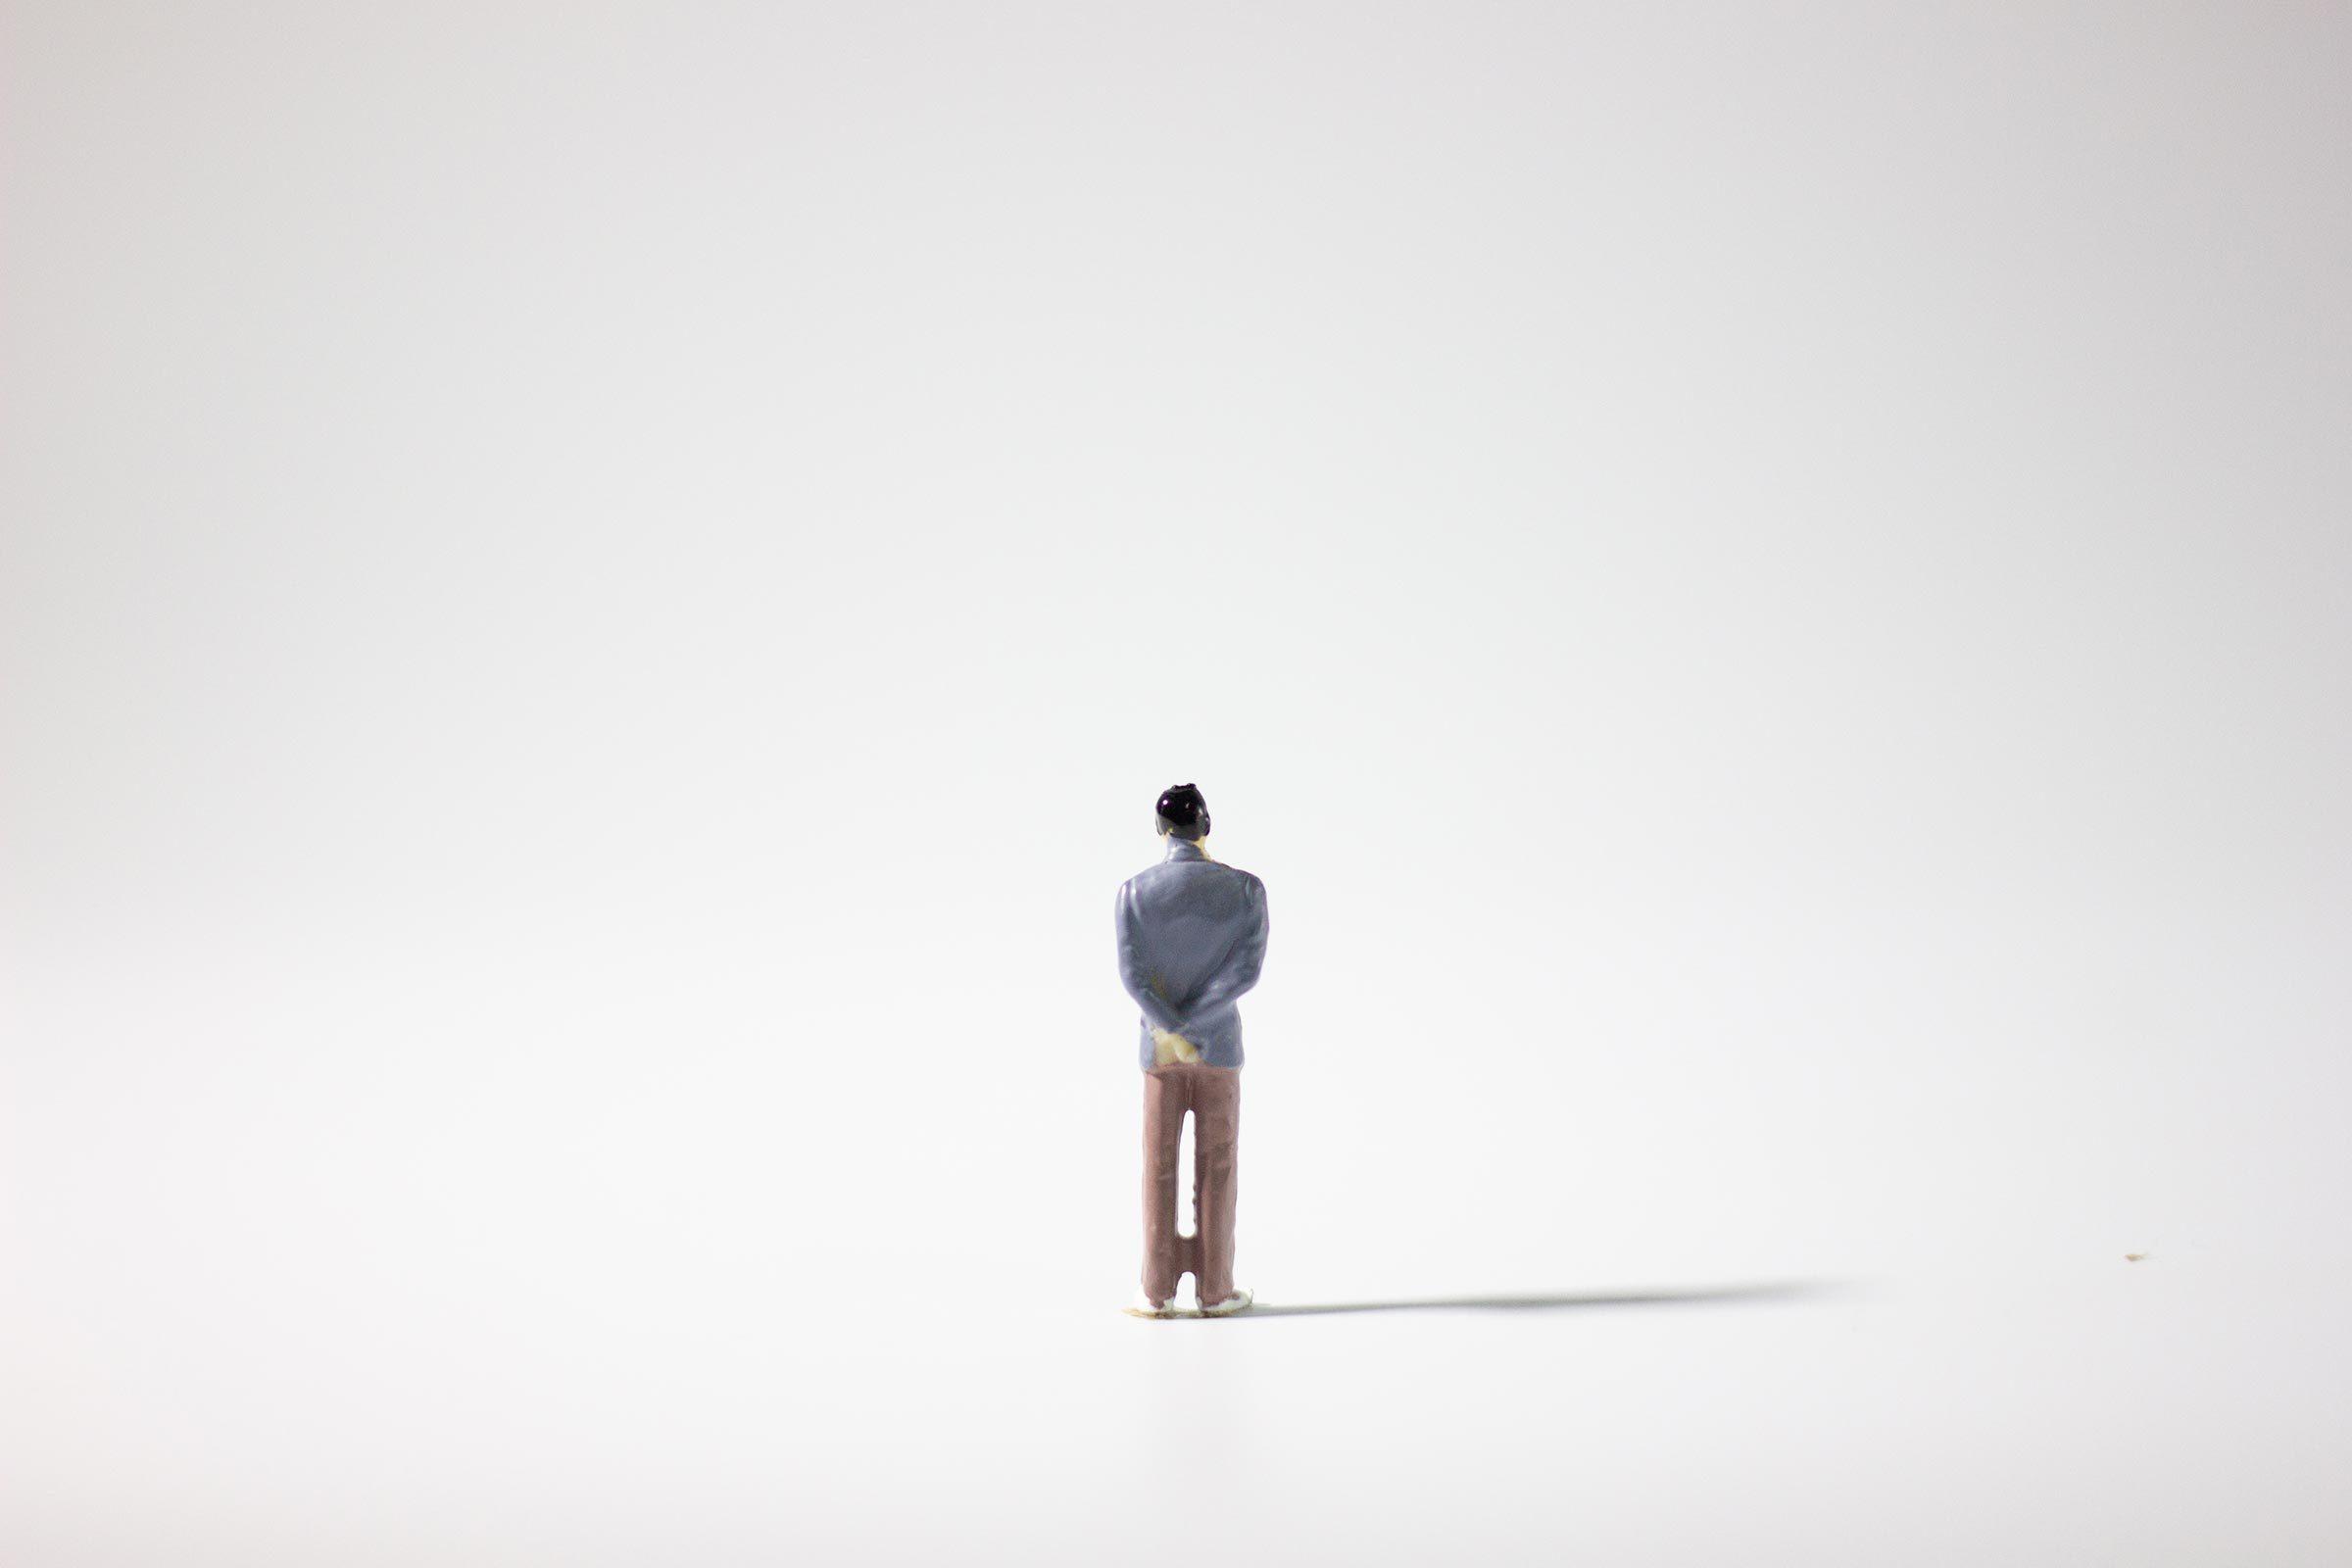 miniature figure alone lonely